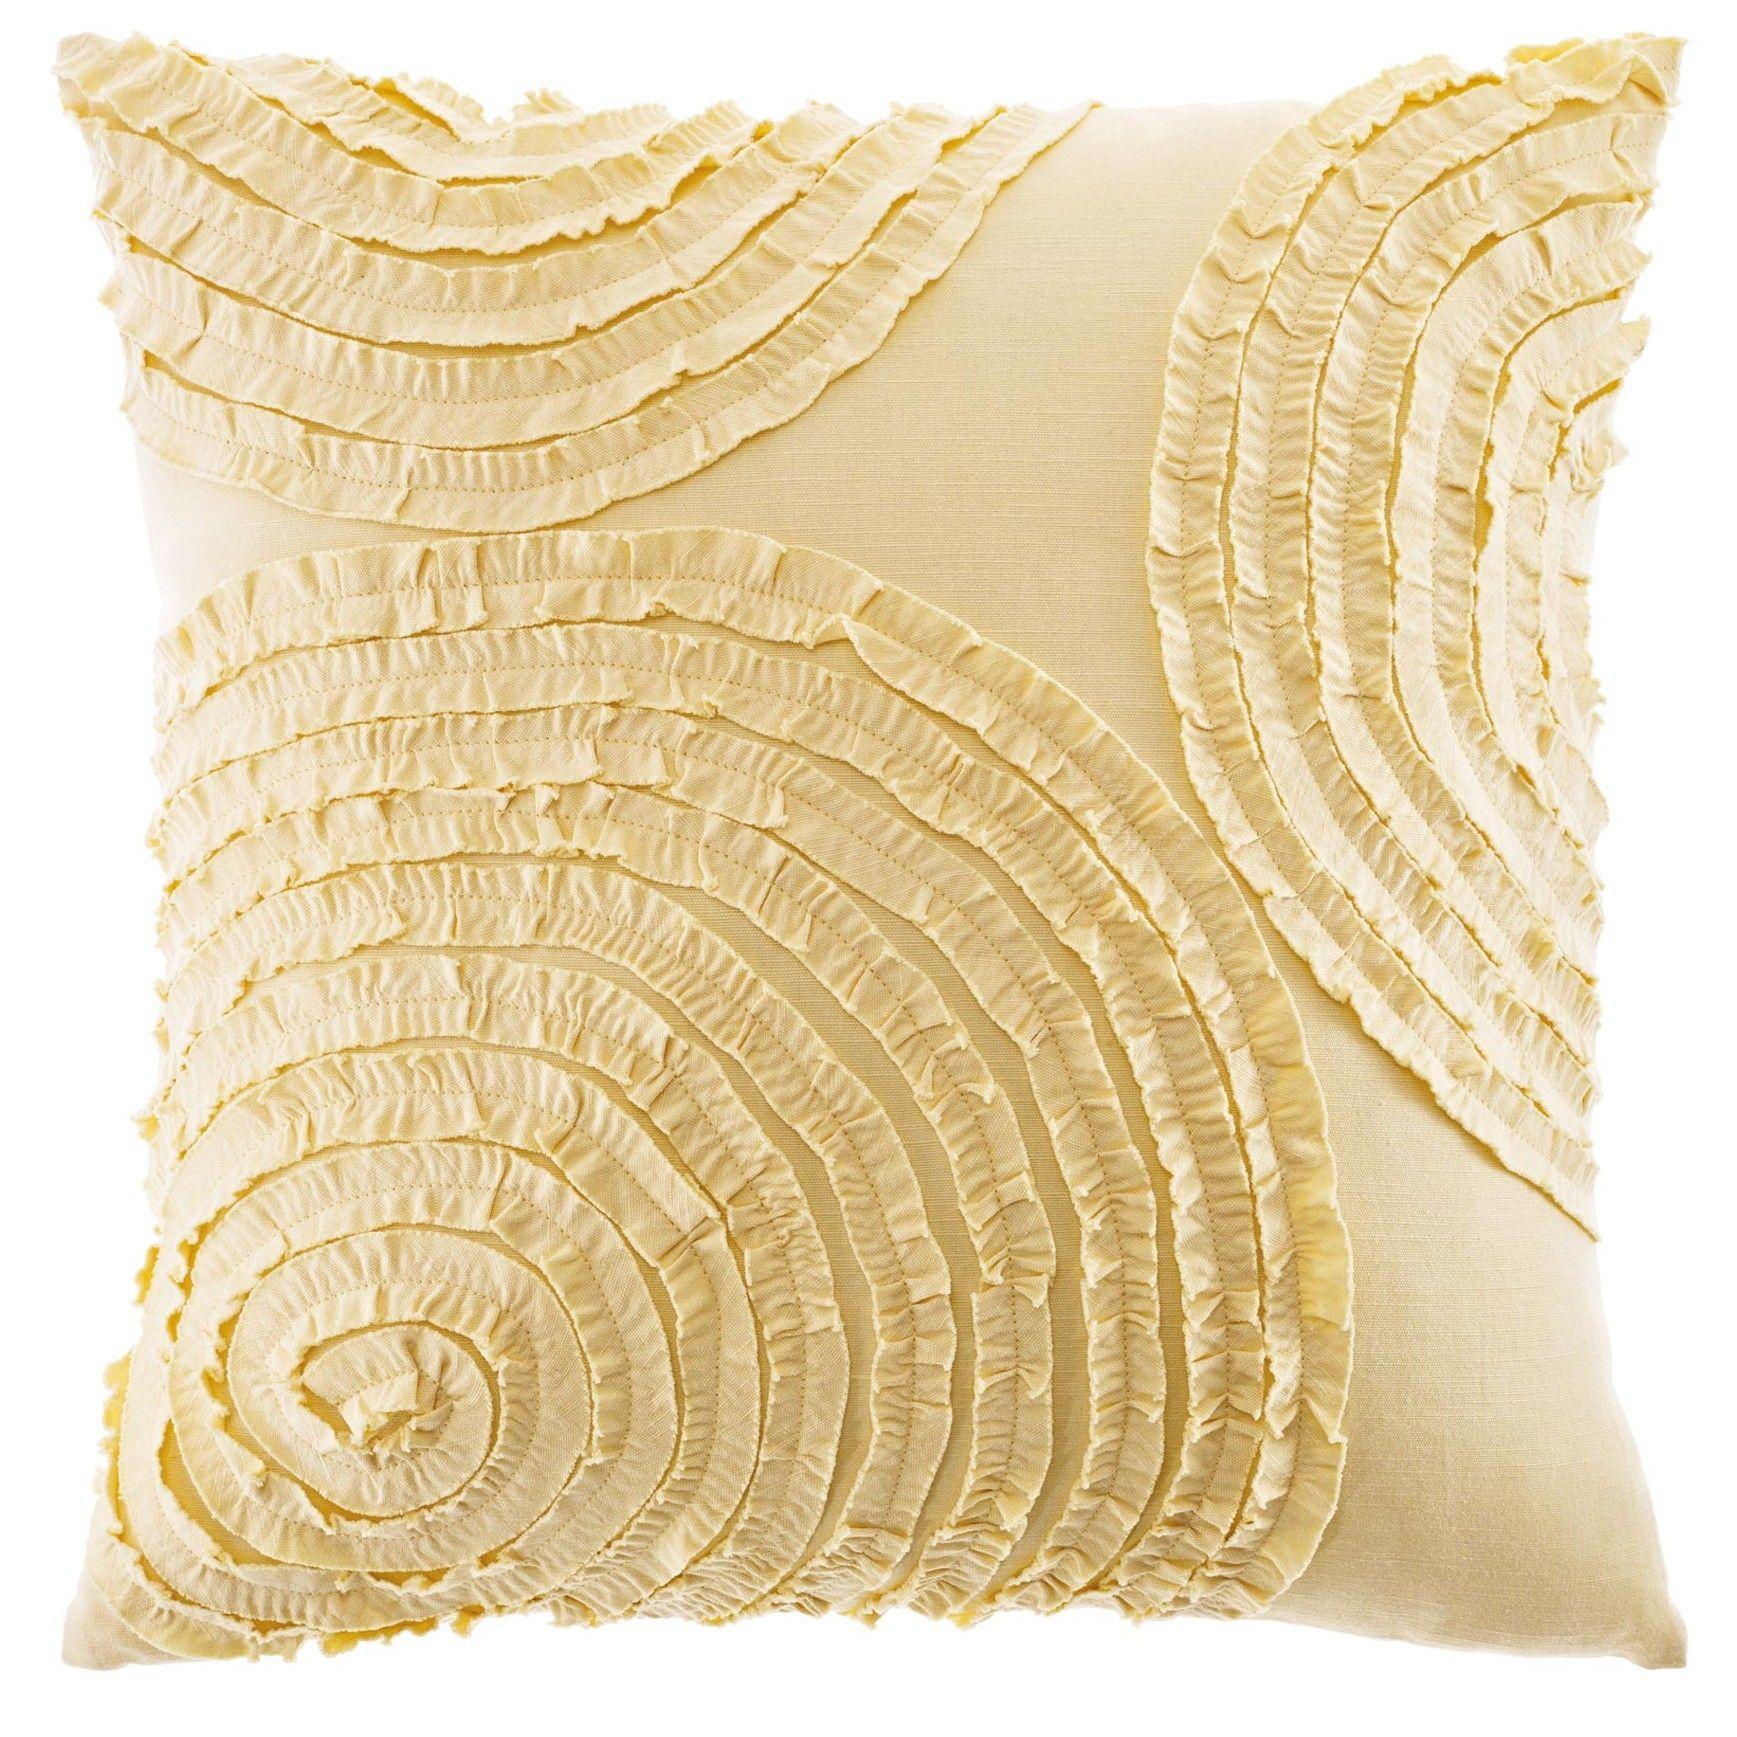 Under the Canopy Eternity Cotton Decorative Throw Pillow u0026 Reviews | Wayfair  sc 1 st  Pinterest & Under the Canopy Eternity Cotton Decorative Throw Pillow u0026 Reviews ...